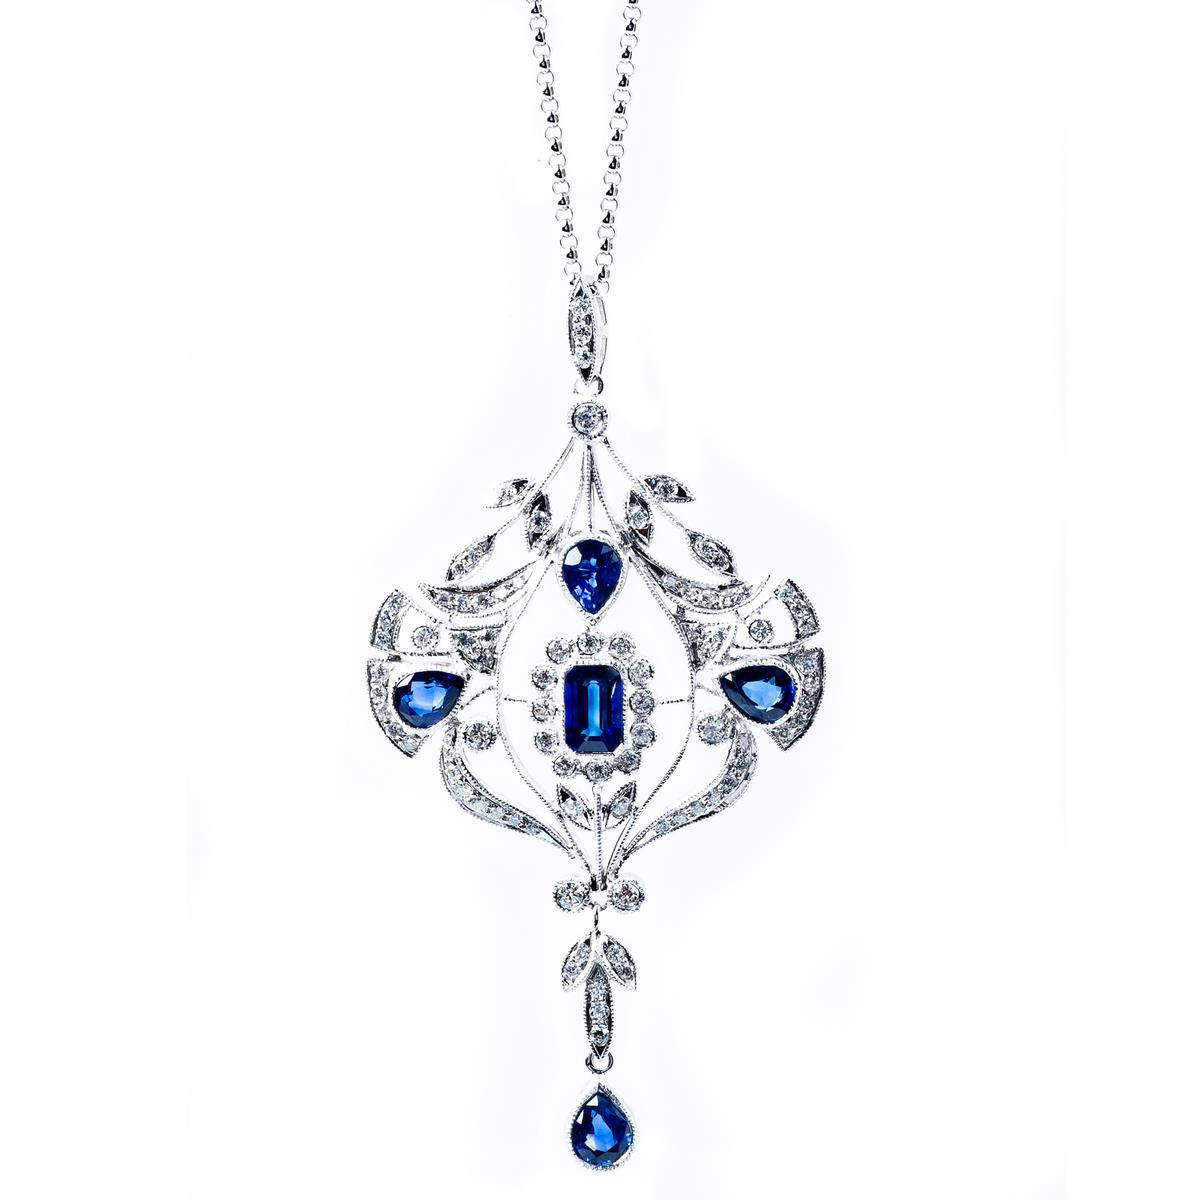 Vintage Edwardian Style Diamond & Sapphire Pendant